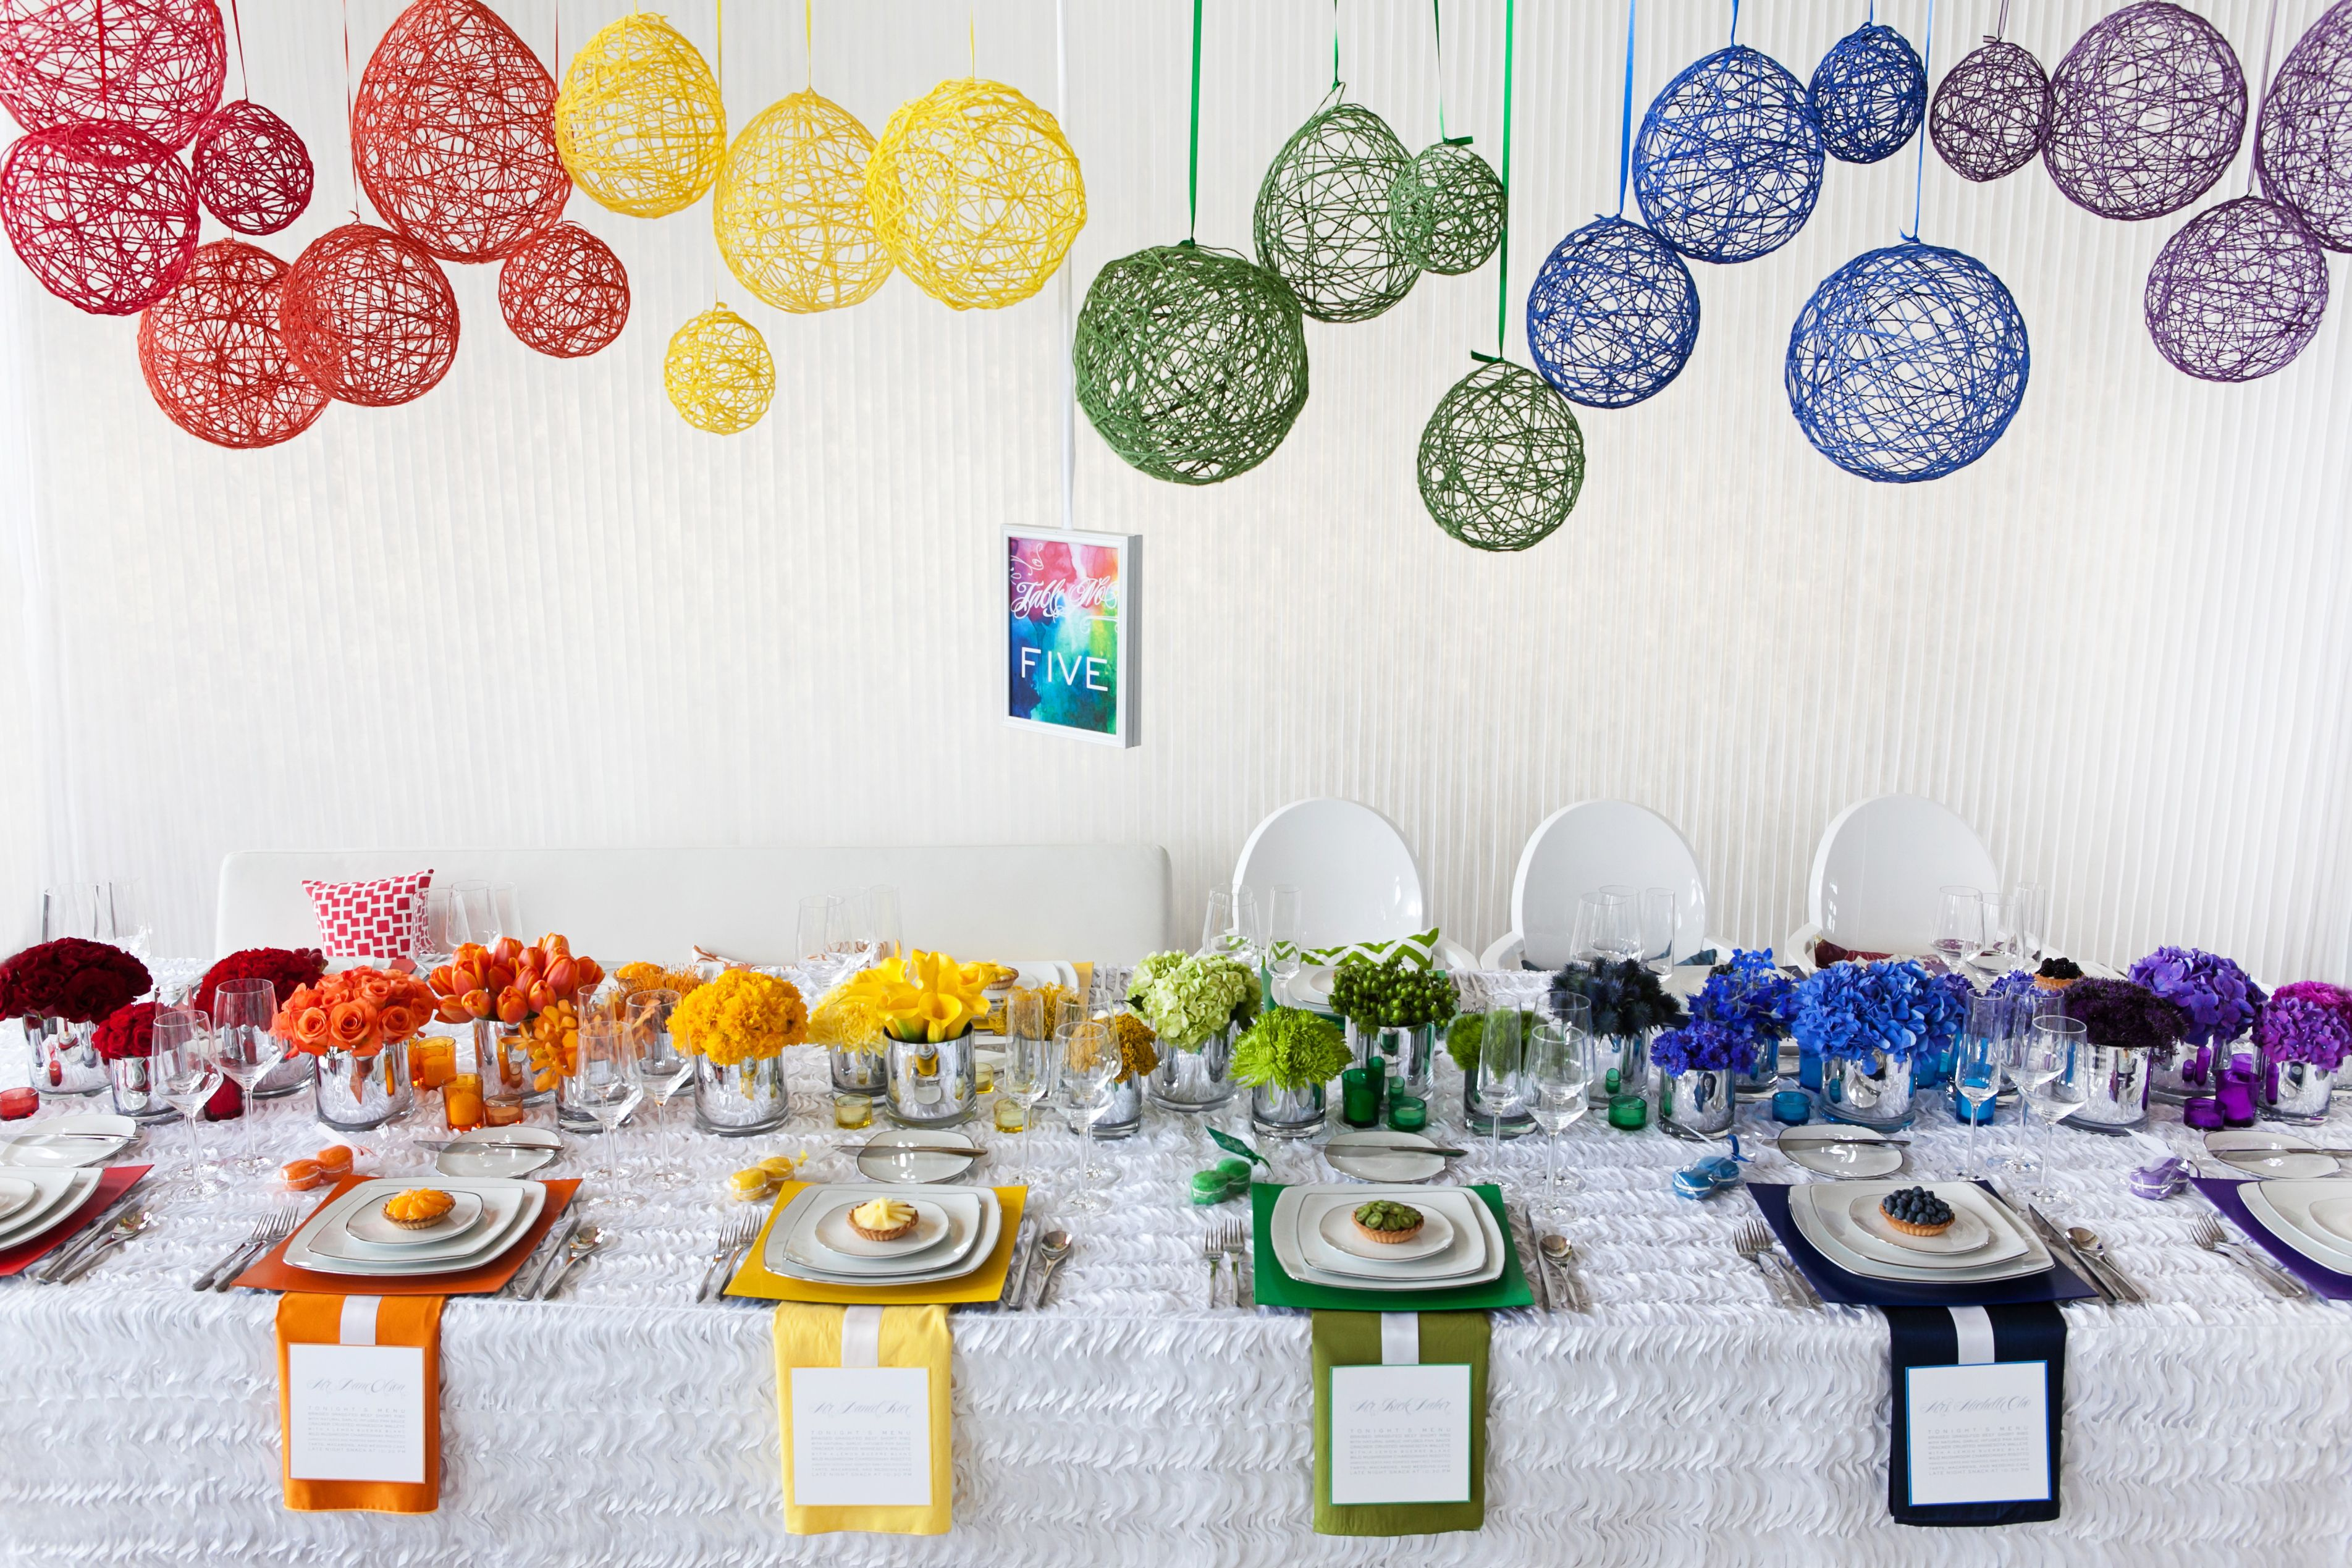 rainbow wedding decorations - Google Search | Wedding decorations ...